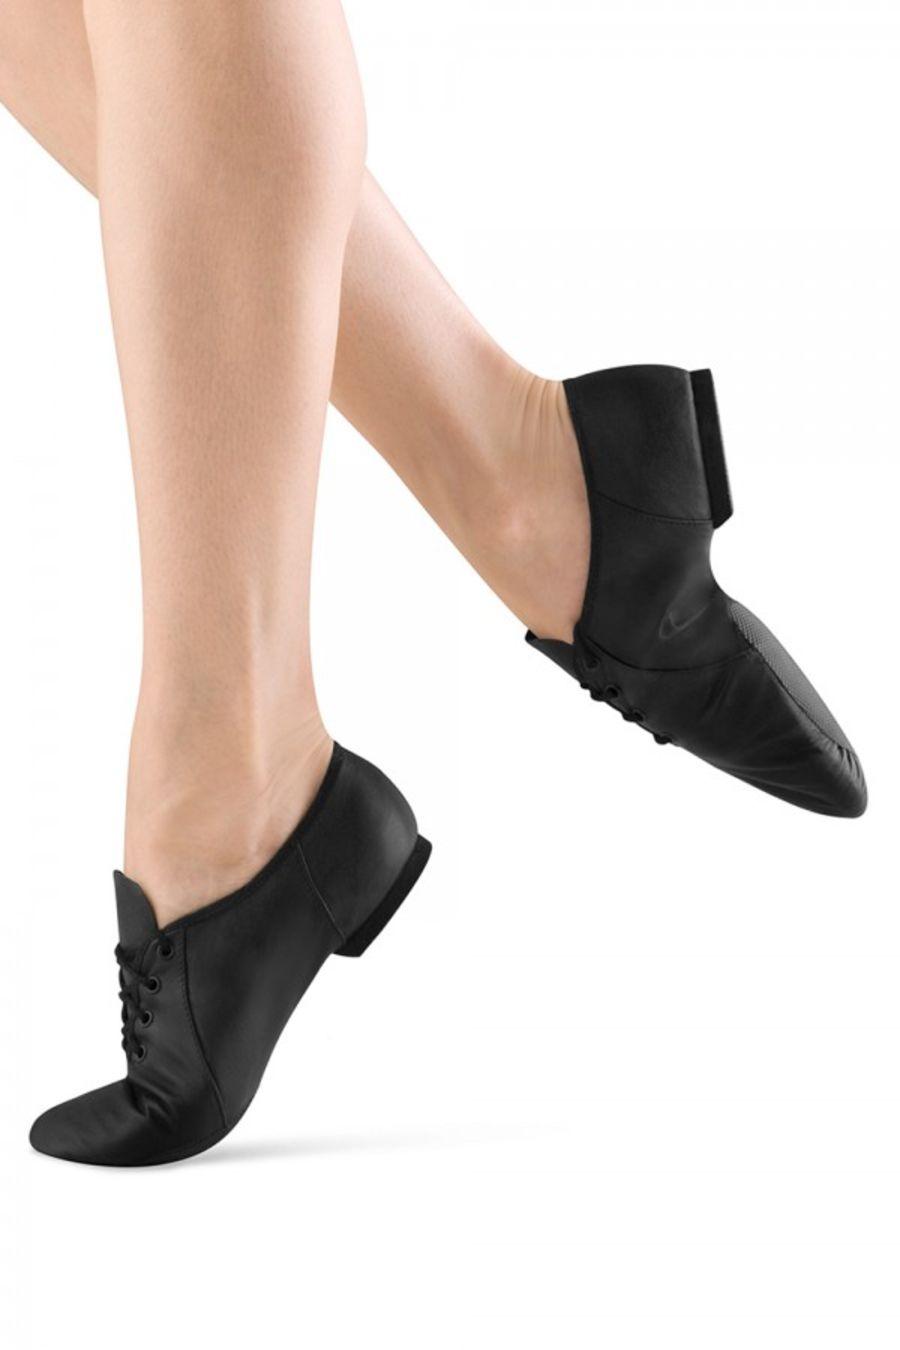 Bloch SO405G/L Jazzsoft Split/sole Jazz Dance shoes